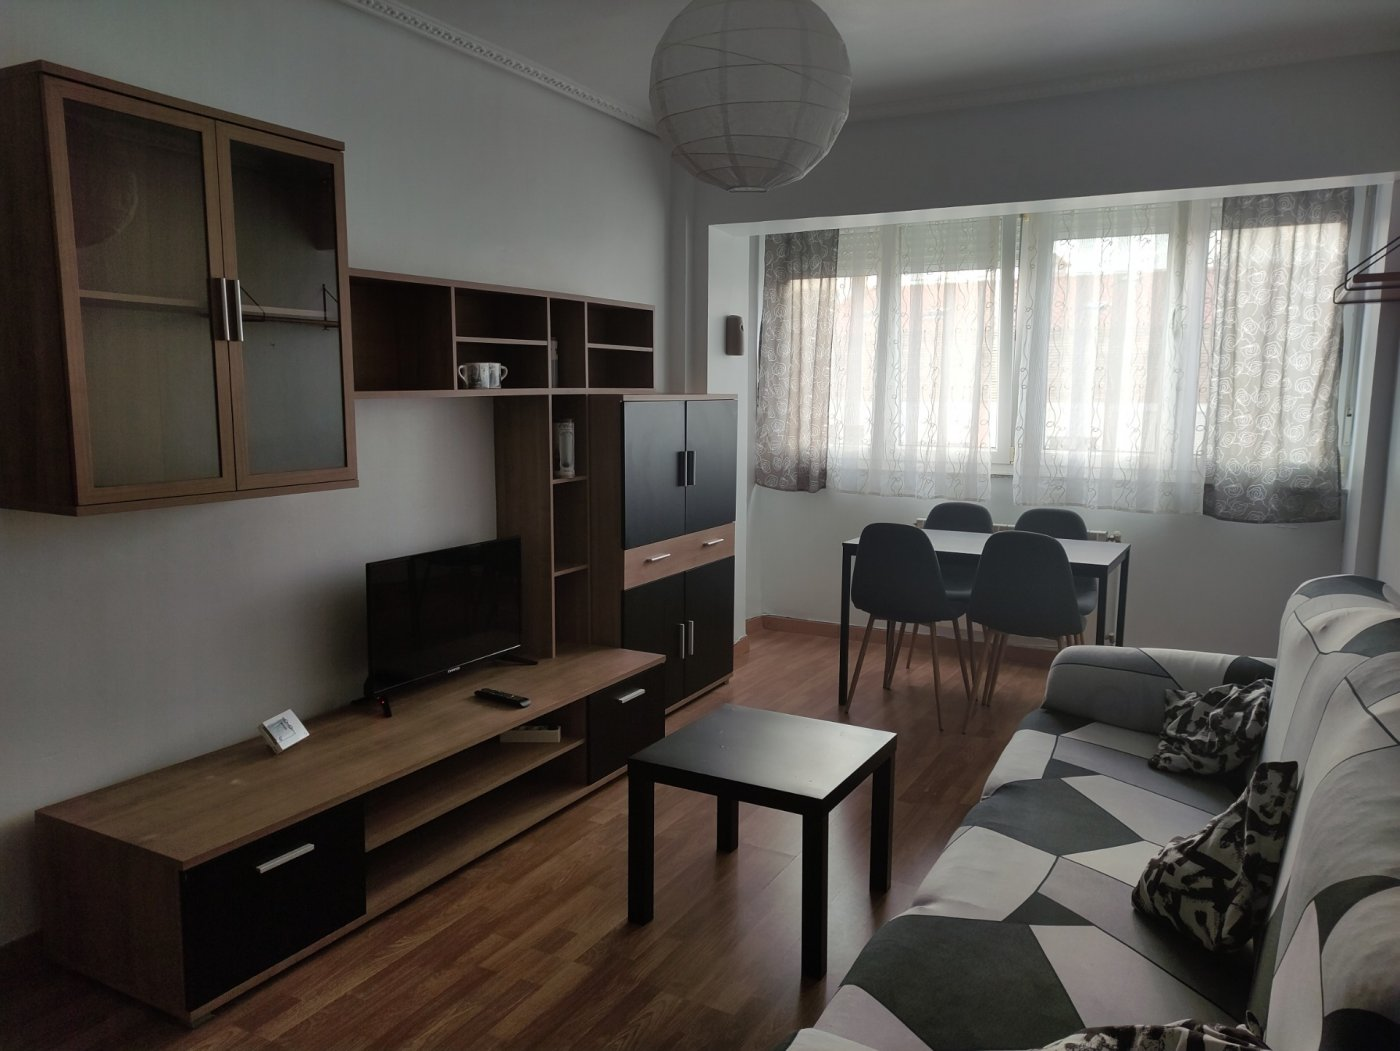 Piso en alquiler en Inmobiliaria - Barreda, Torrelavega